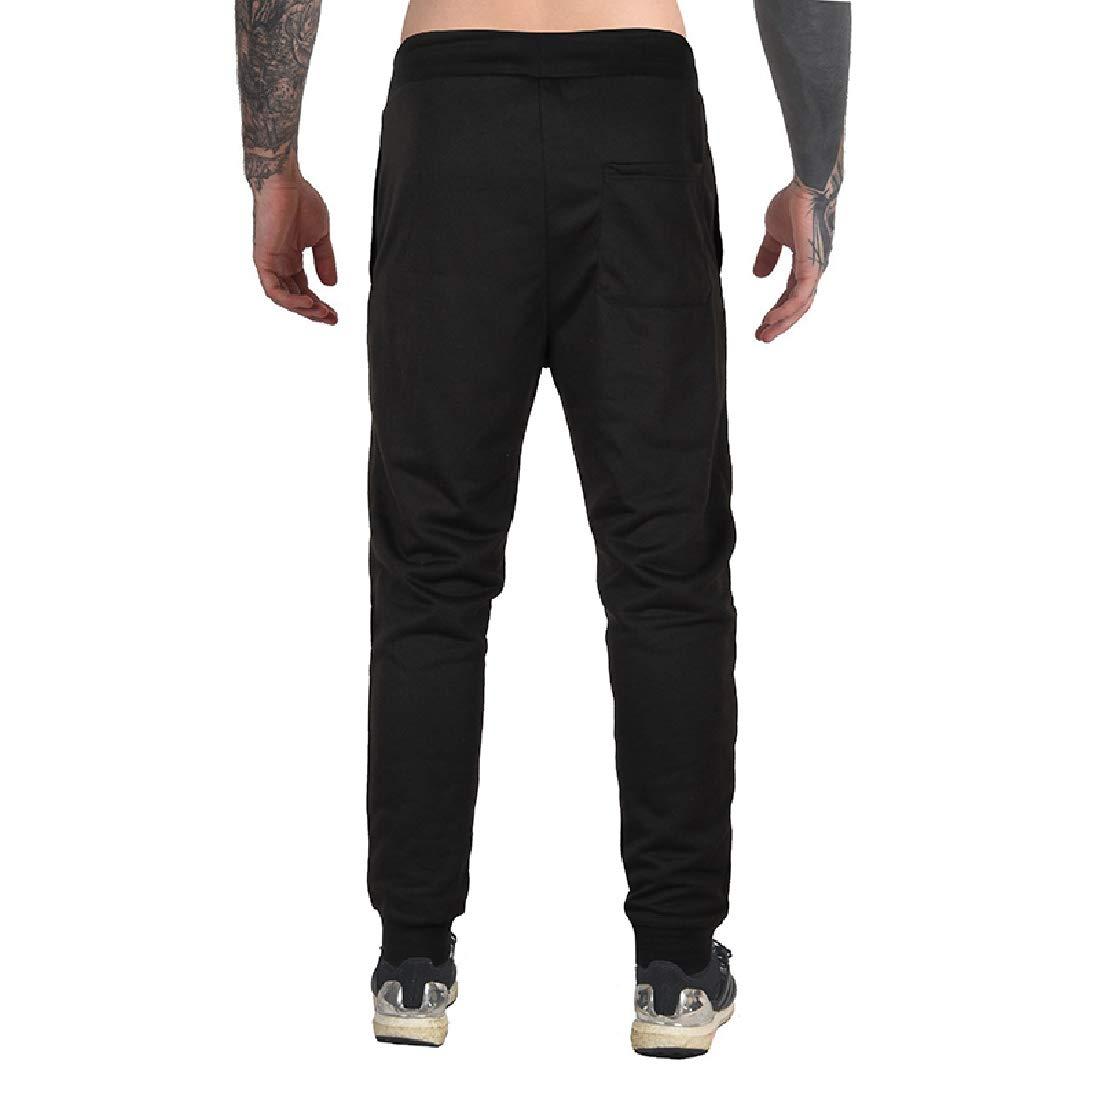 Andopa Mens Sports Drawstring Vogue Casual Loose Cotton Sport Pants